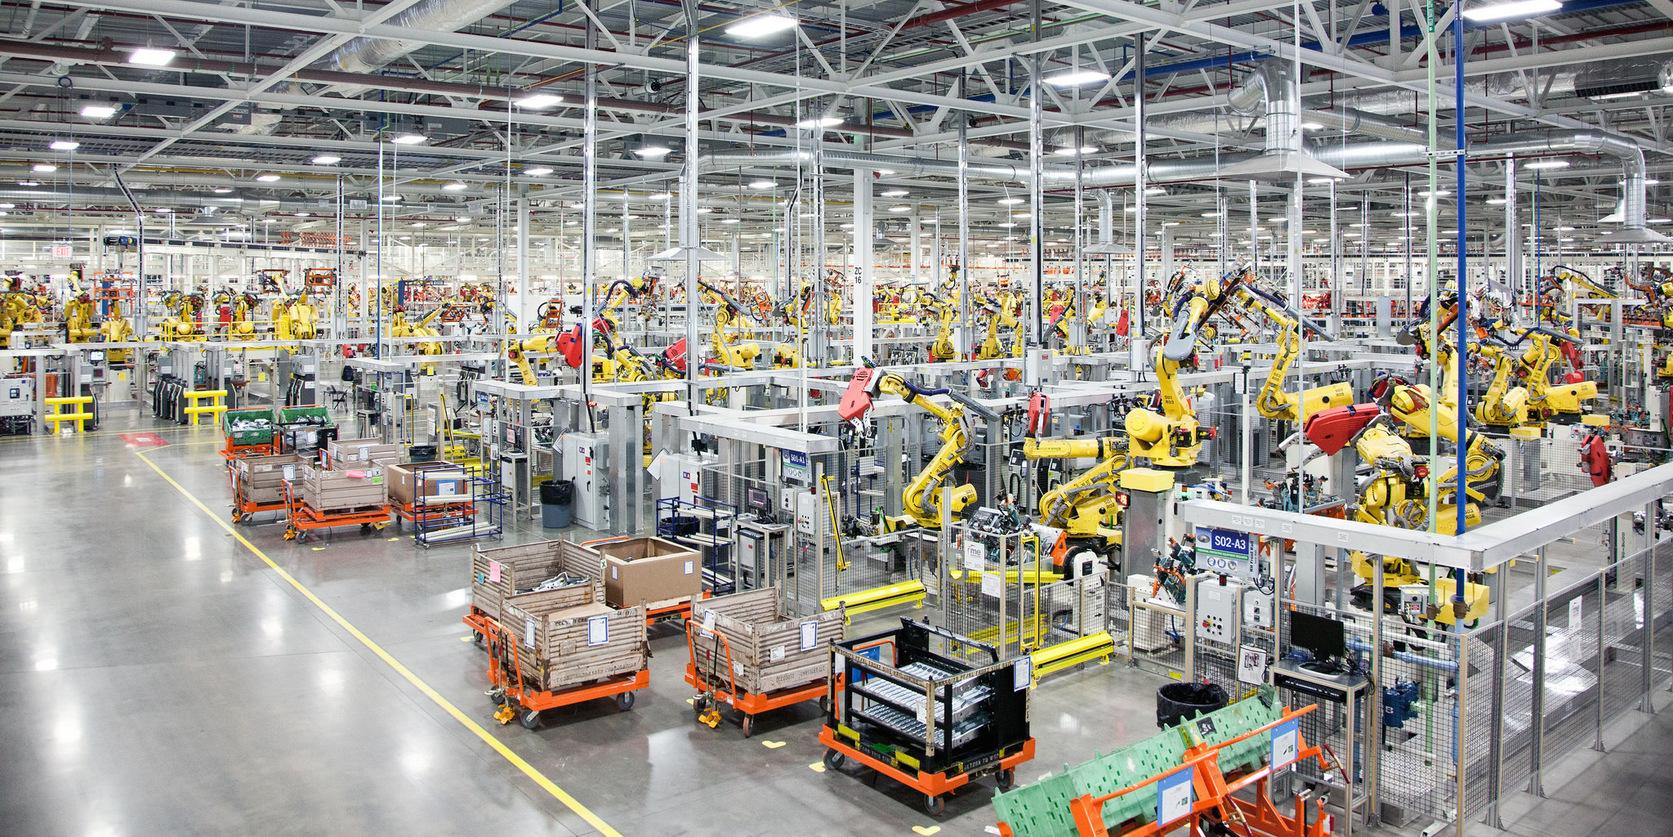 Foxconn nov proizvodni obrat